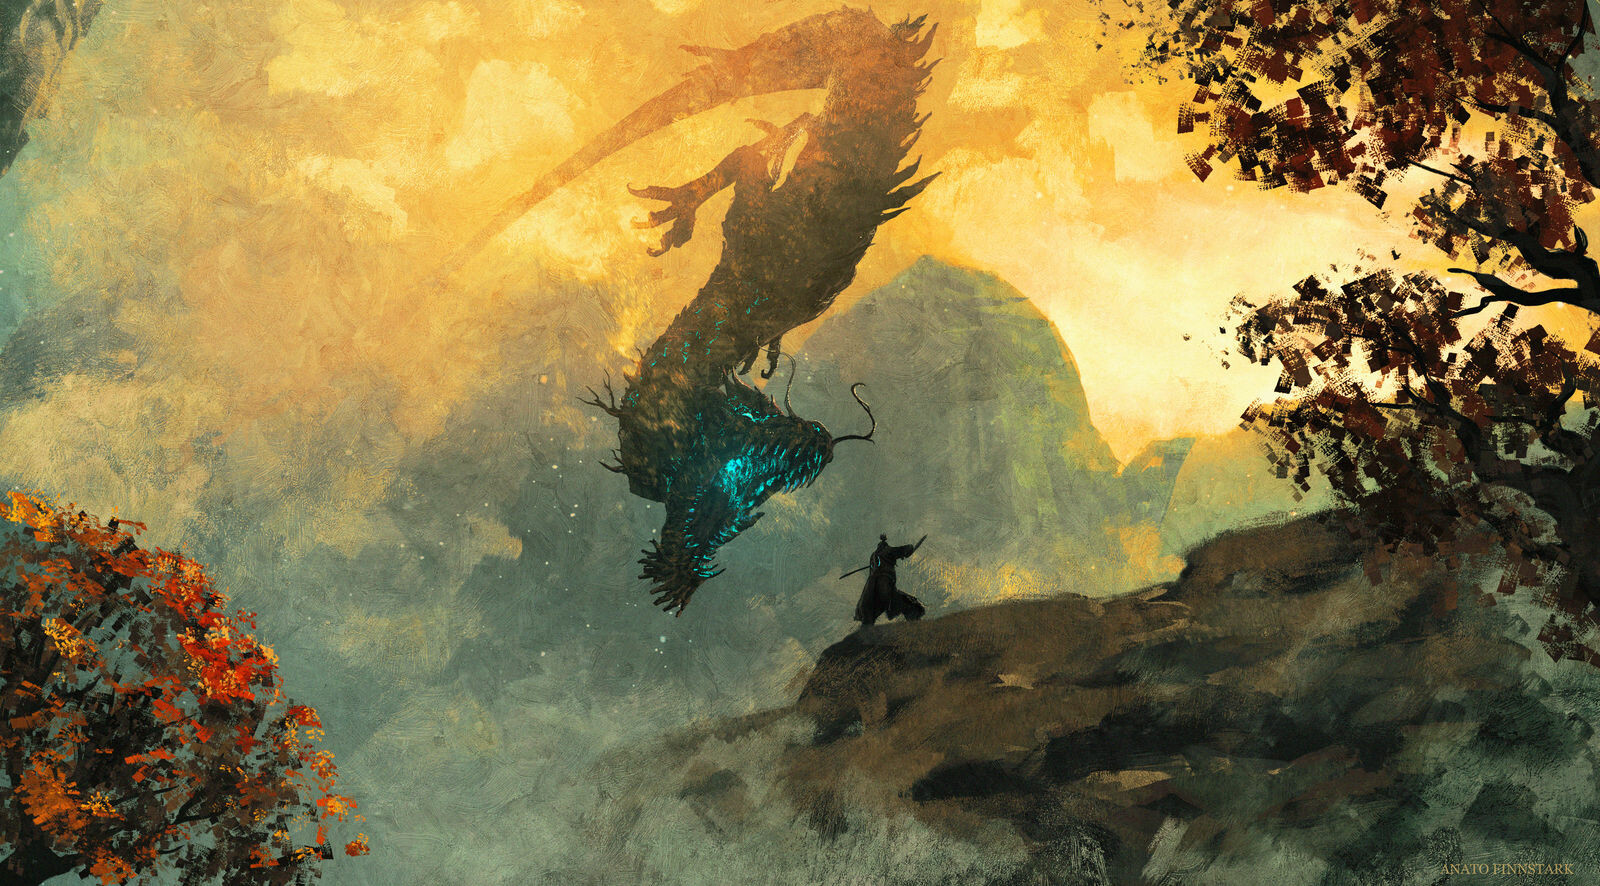 Anato finnstark sekiro dragon s blood by anatofinnstark dd6ng9p fullview